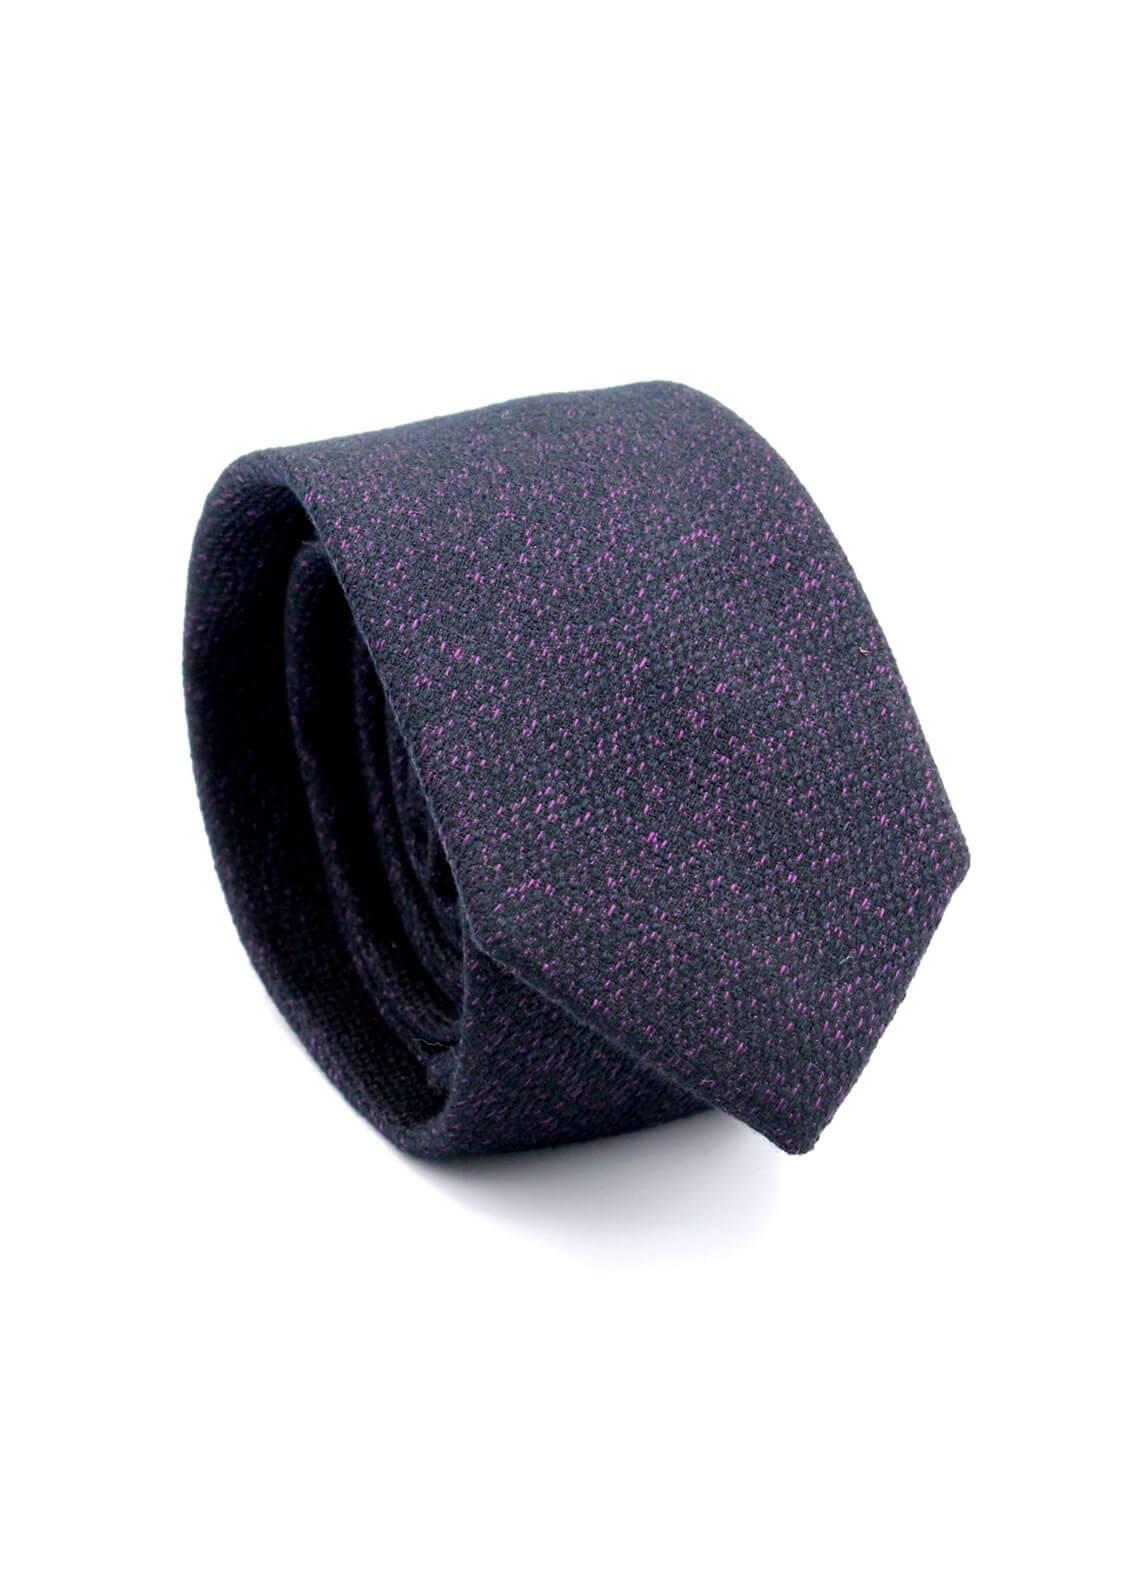 Skangen Narrow Wool Neck Tie Neck Tie SKTI-W-007 -